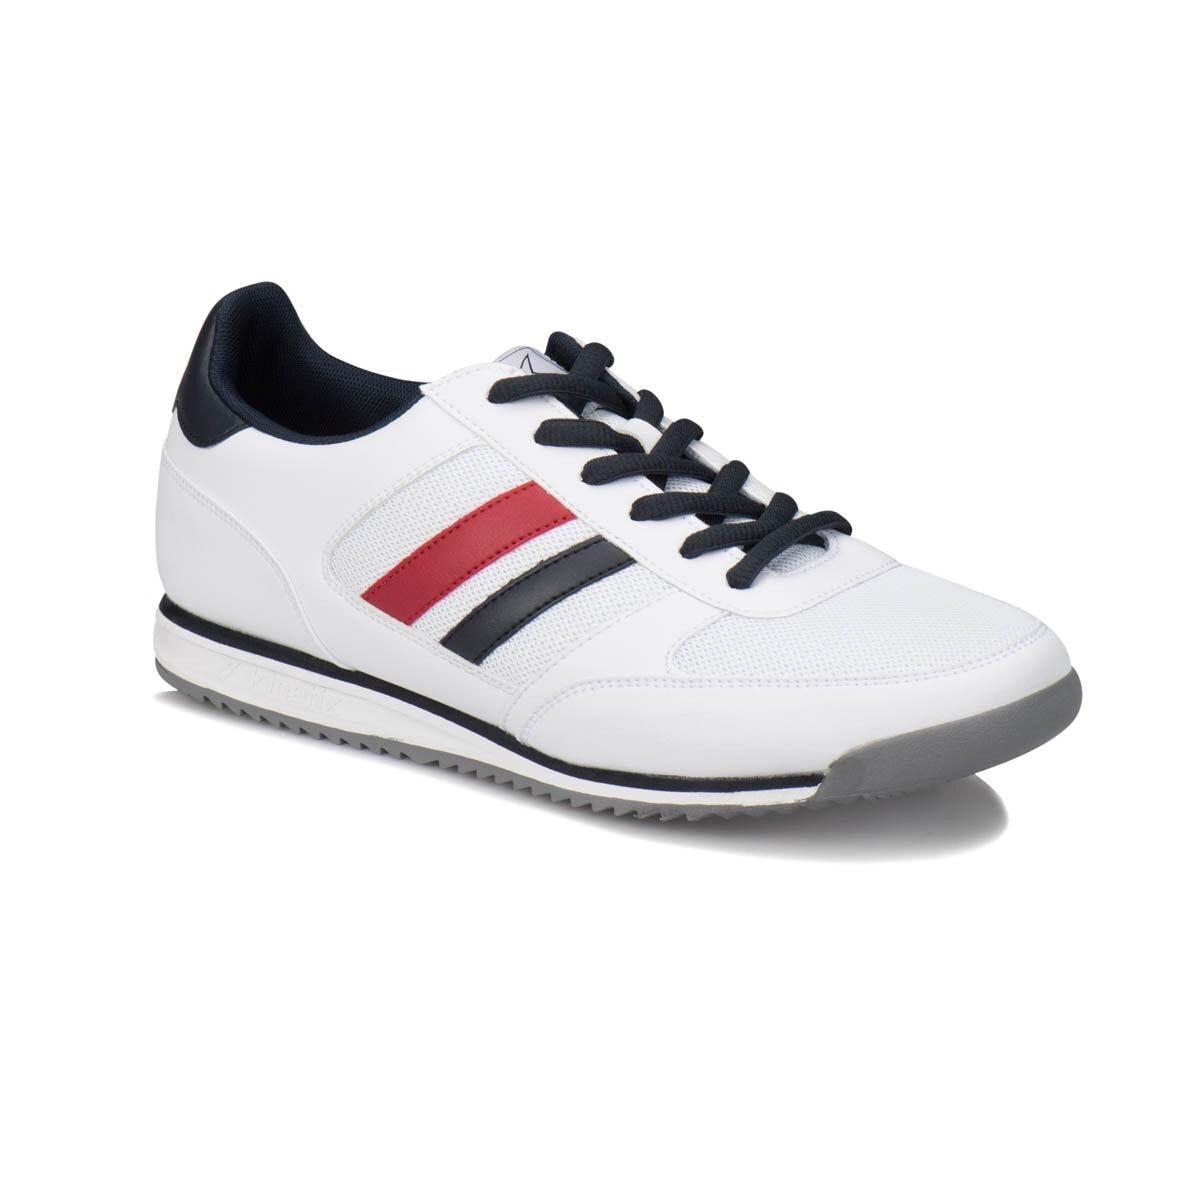 FLO Men's Sneakers Sport Casual Shoes Navy Blue KINETIX TRAMOR MESH